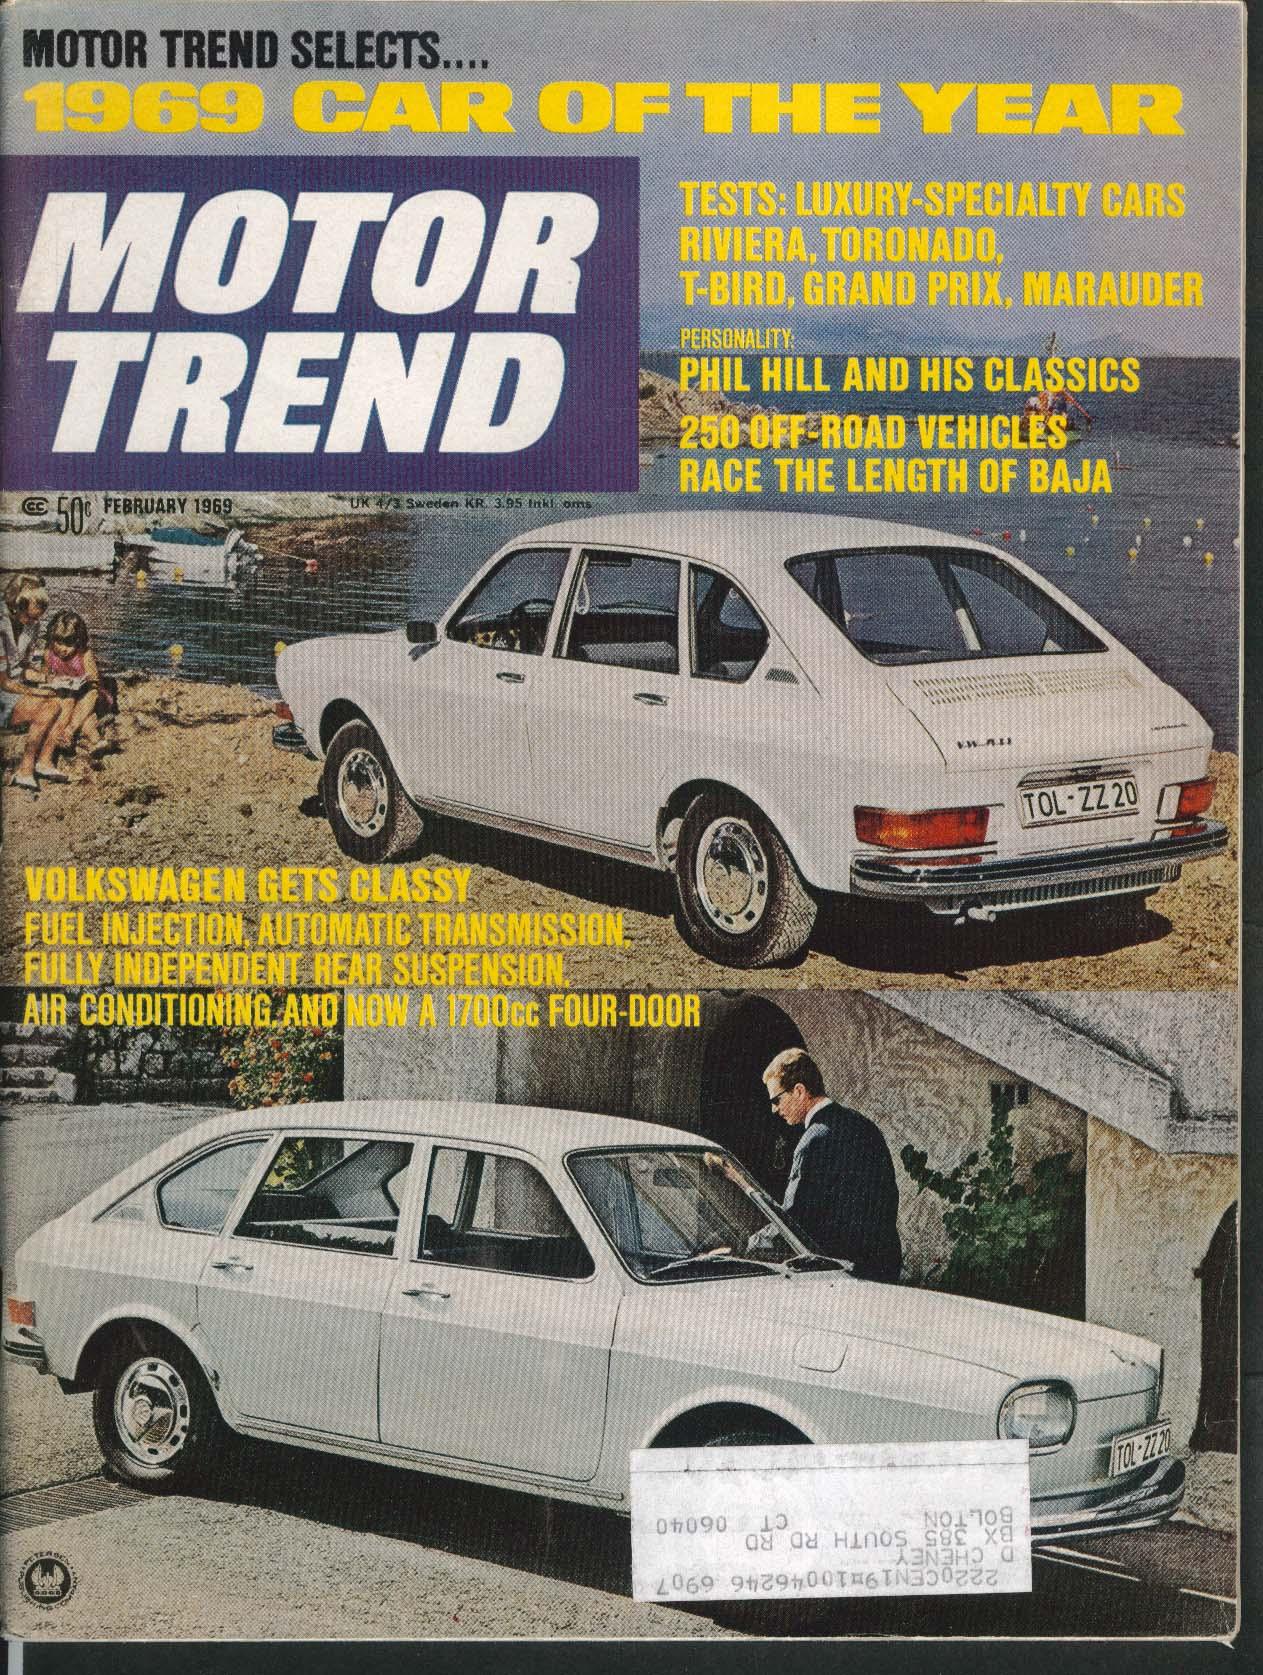 MOTOR TREND Volkswagen 411 Riviera Toronato Thunderbird Grand Prix ++ 2 1969